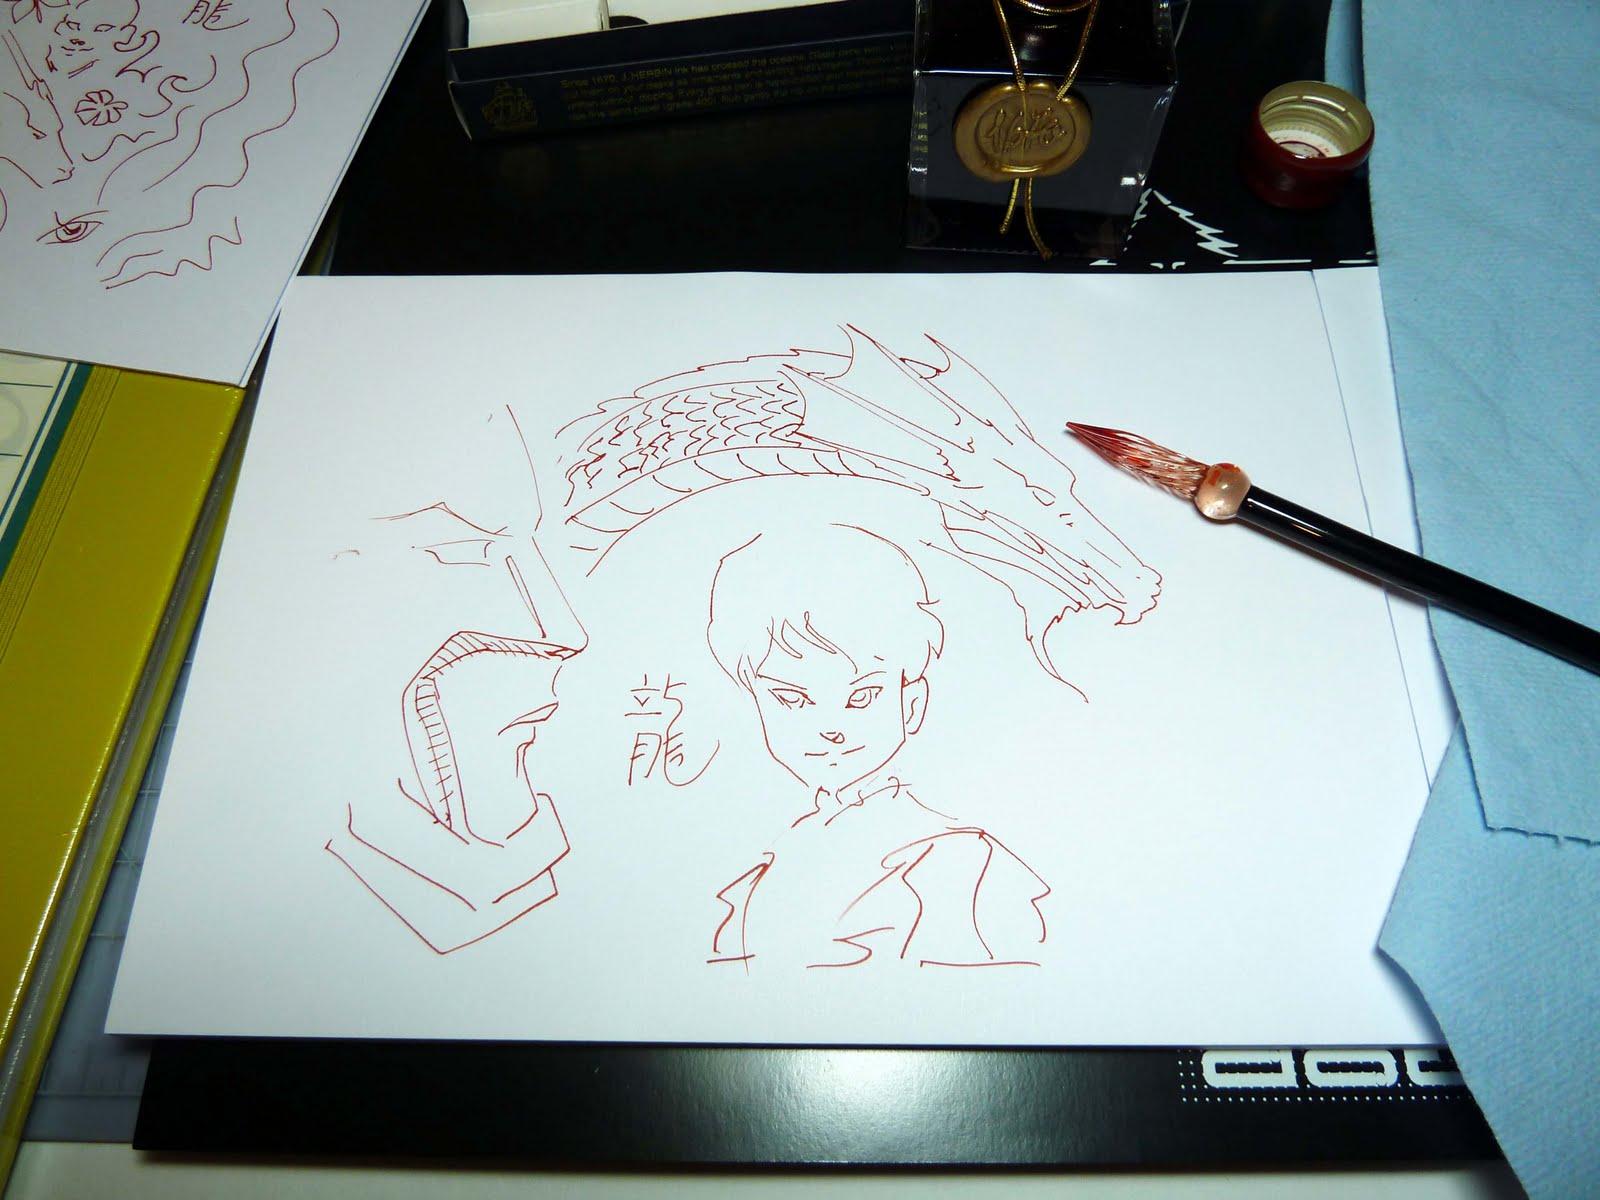 http://1.bp.blogspot.com/_idUARdOEJAk/TDbPNgnuKPI/AAAAAAAAHi0/CpBHfY_J34k/s1600/J+Herbin+1670+test+doodle+on+Clairefontaine+Triomphe+paper+a.jpg